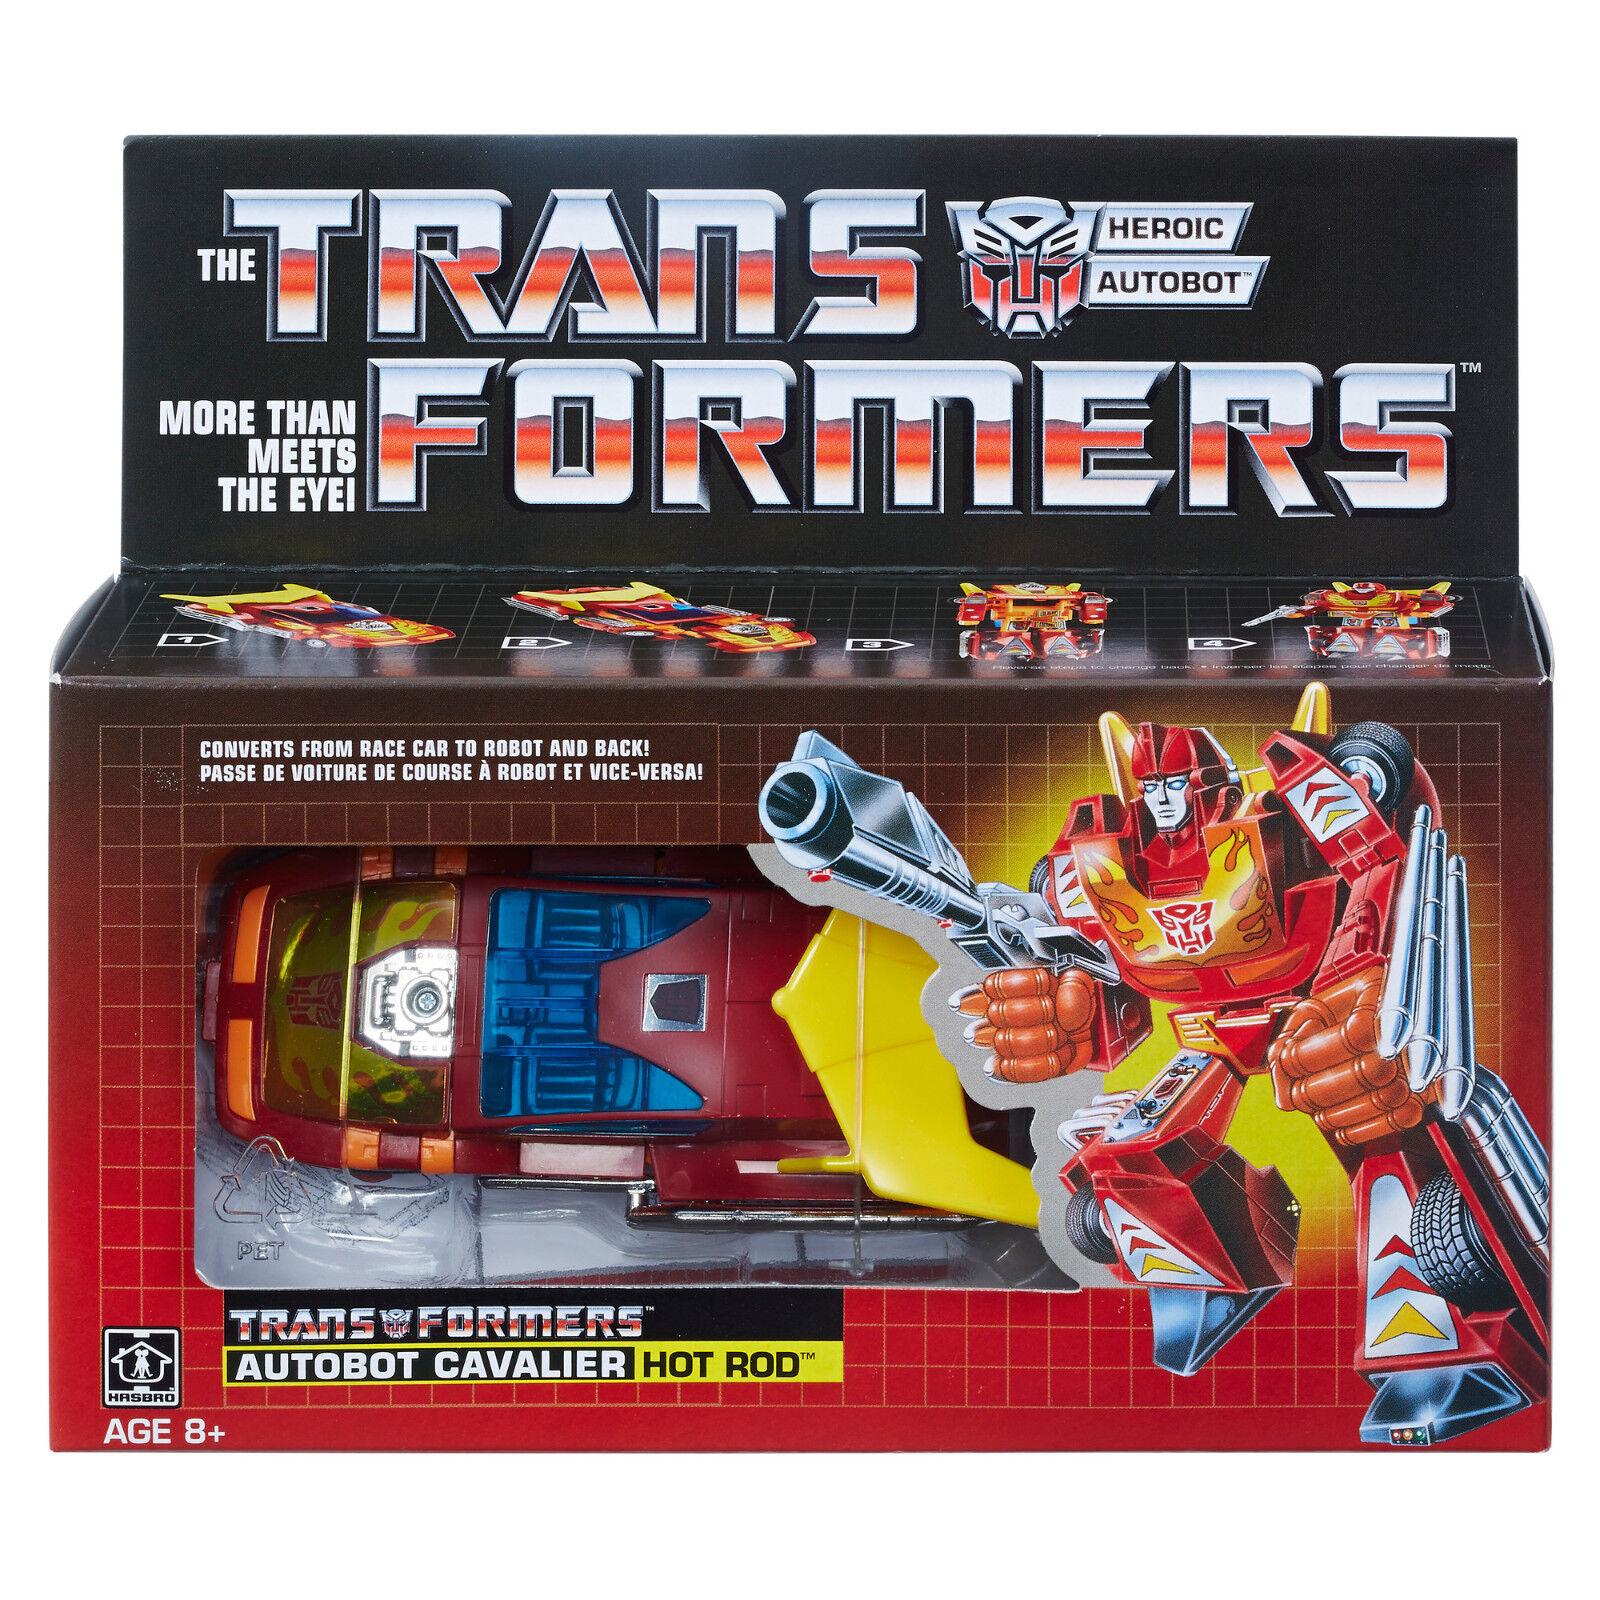 Hasbro Transformers Vintage G1 Autobot Hot Rod Walmart Exclusive Reissue Figure